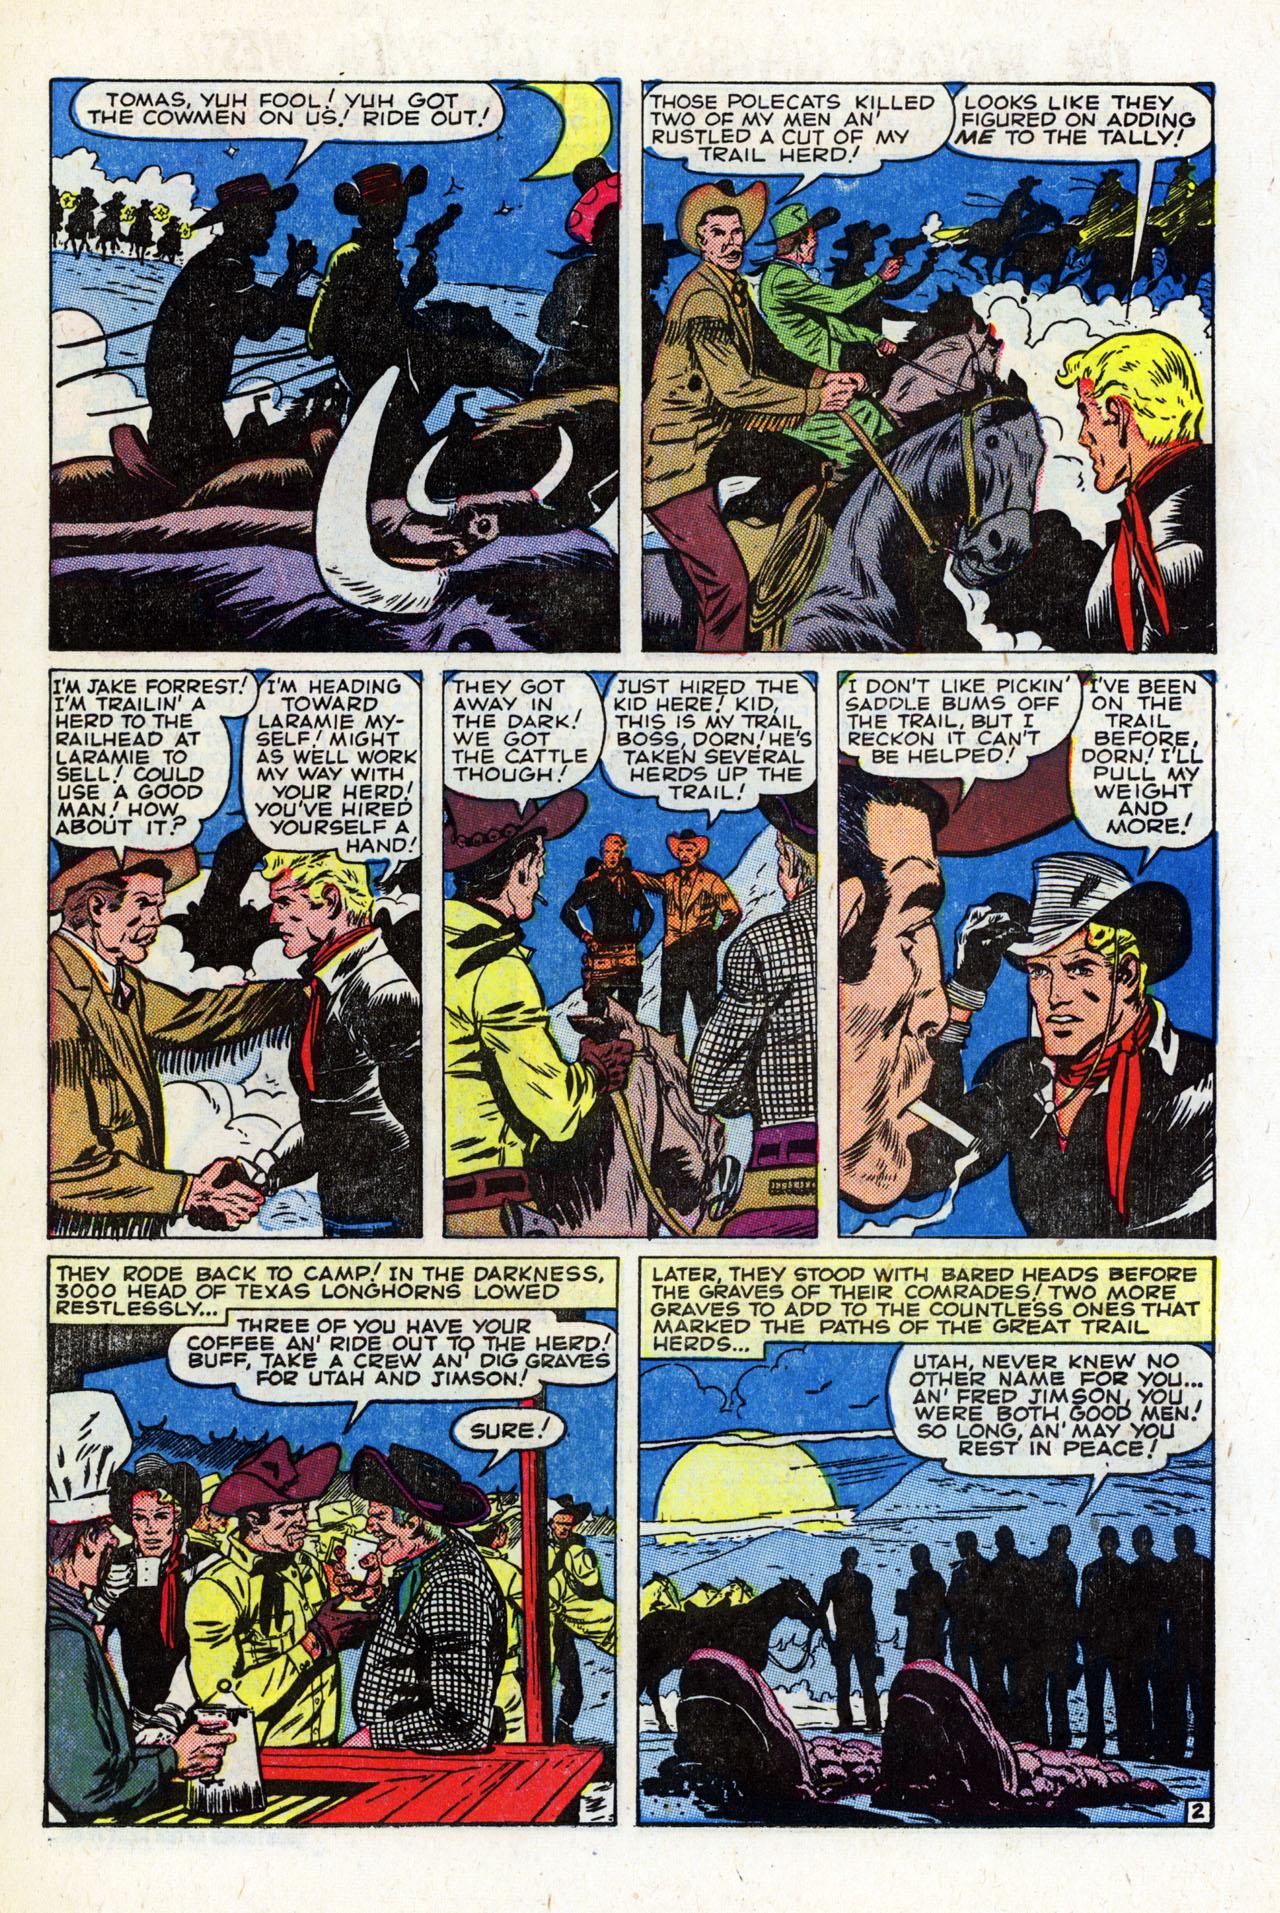 Read online Two-Gun Kid comic -  Issue #23 - 11